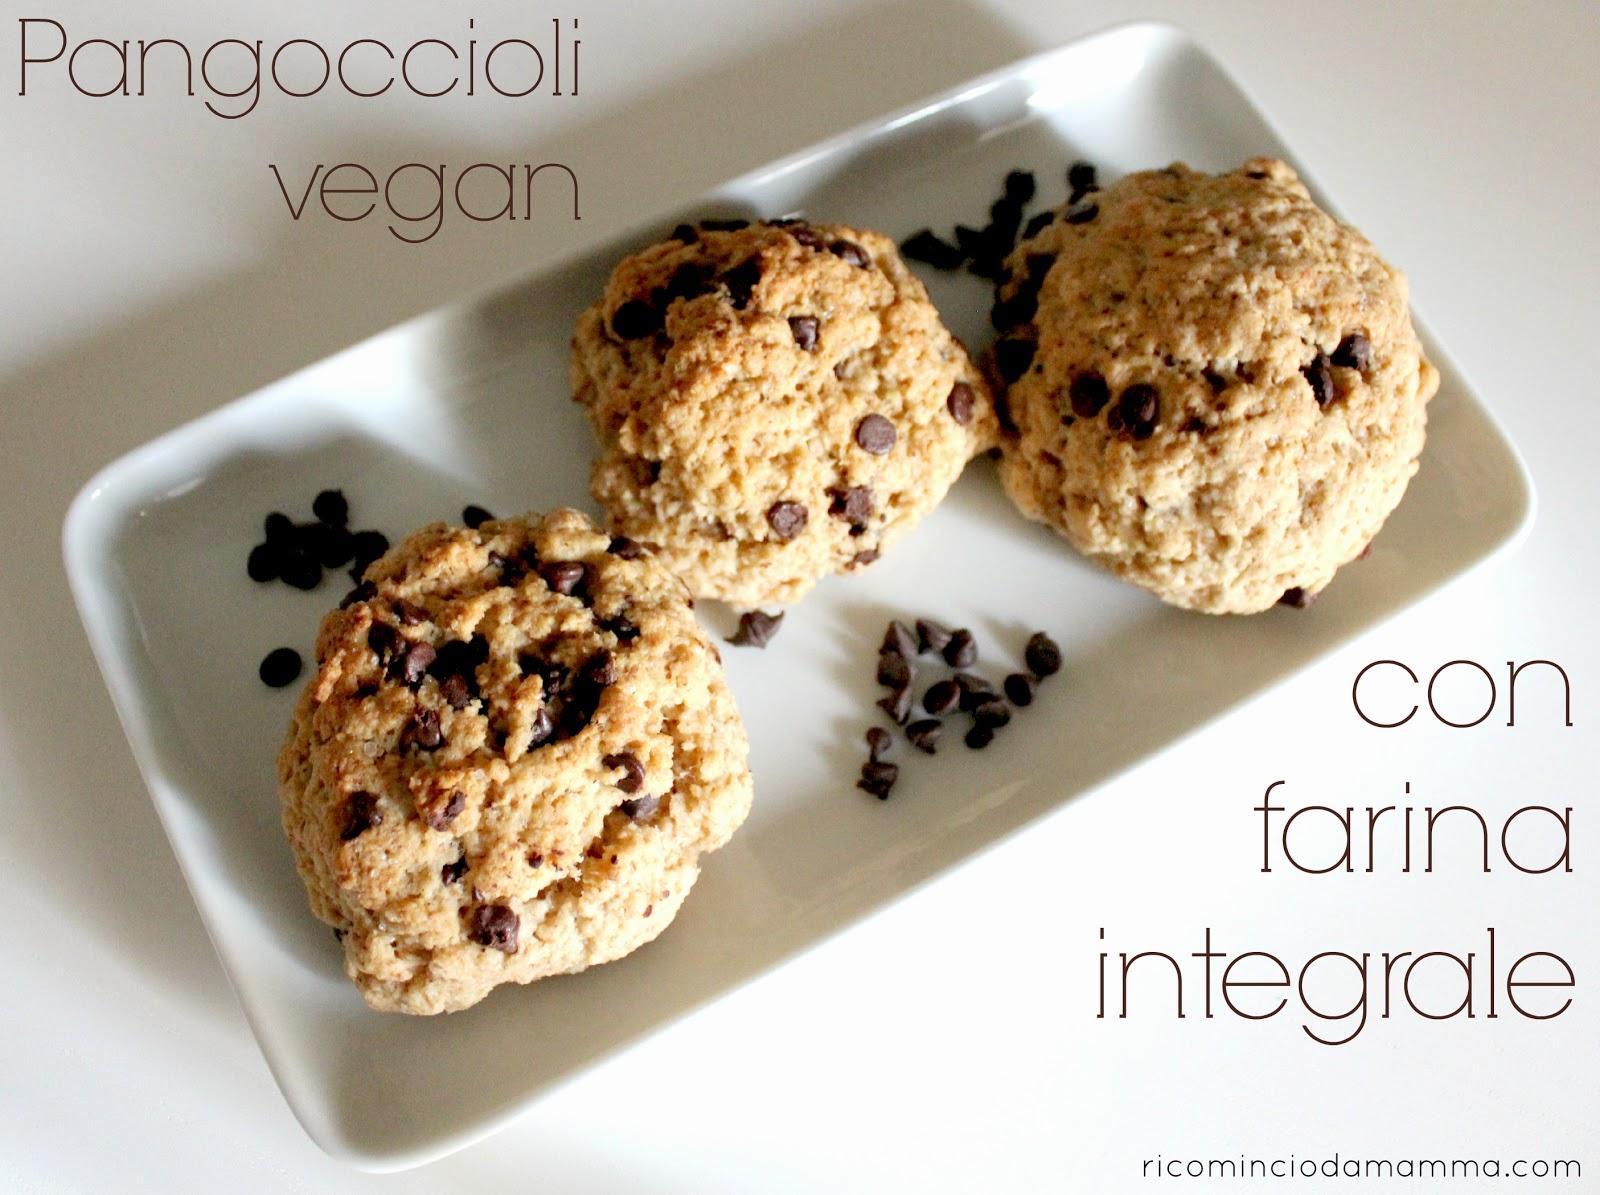 pangoccioli vegan con farina integrale